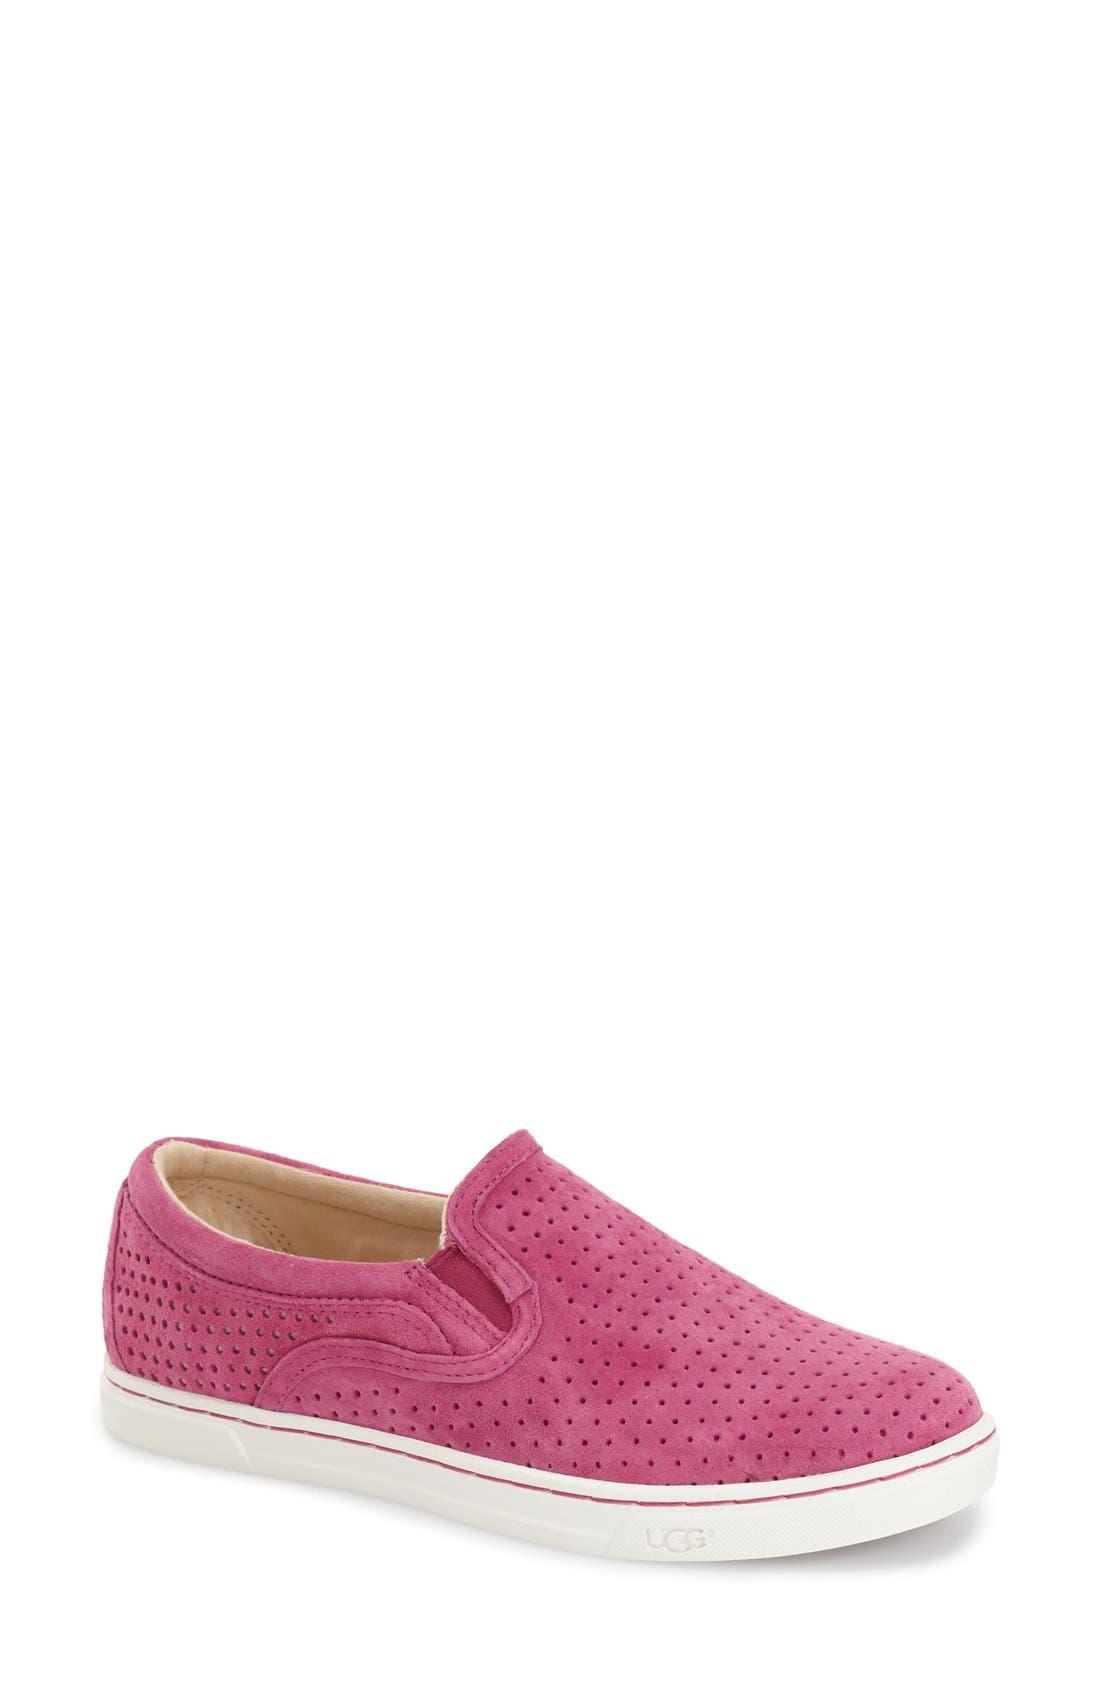 UGG<SUP>®</SUP> Fierce Geo Perforated Slip-On Sneaker